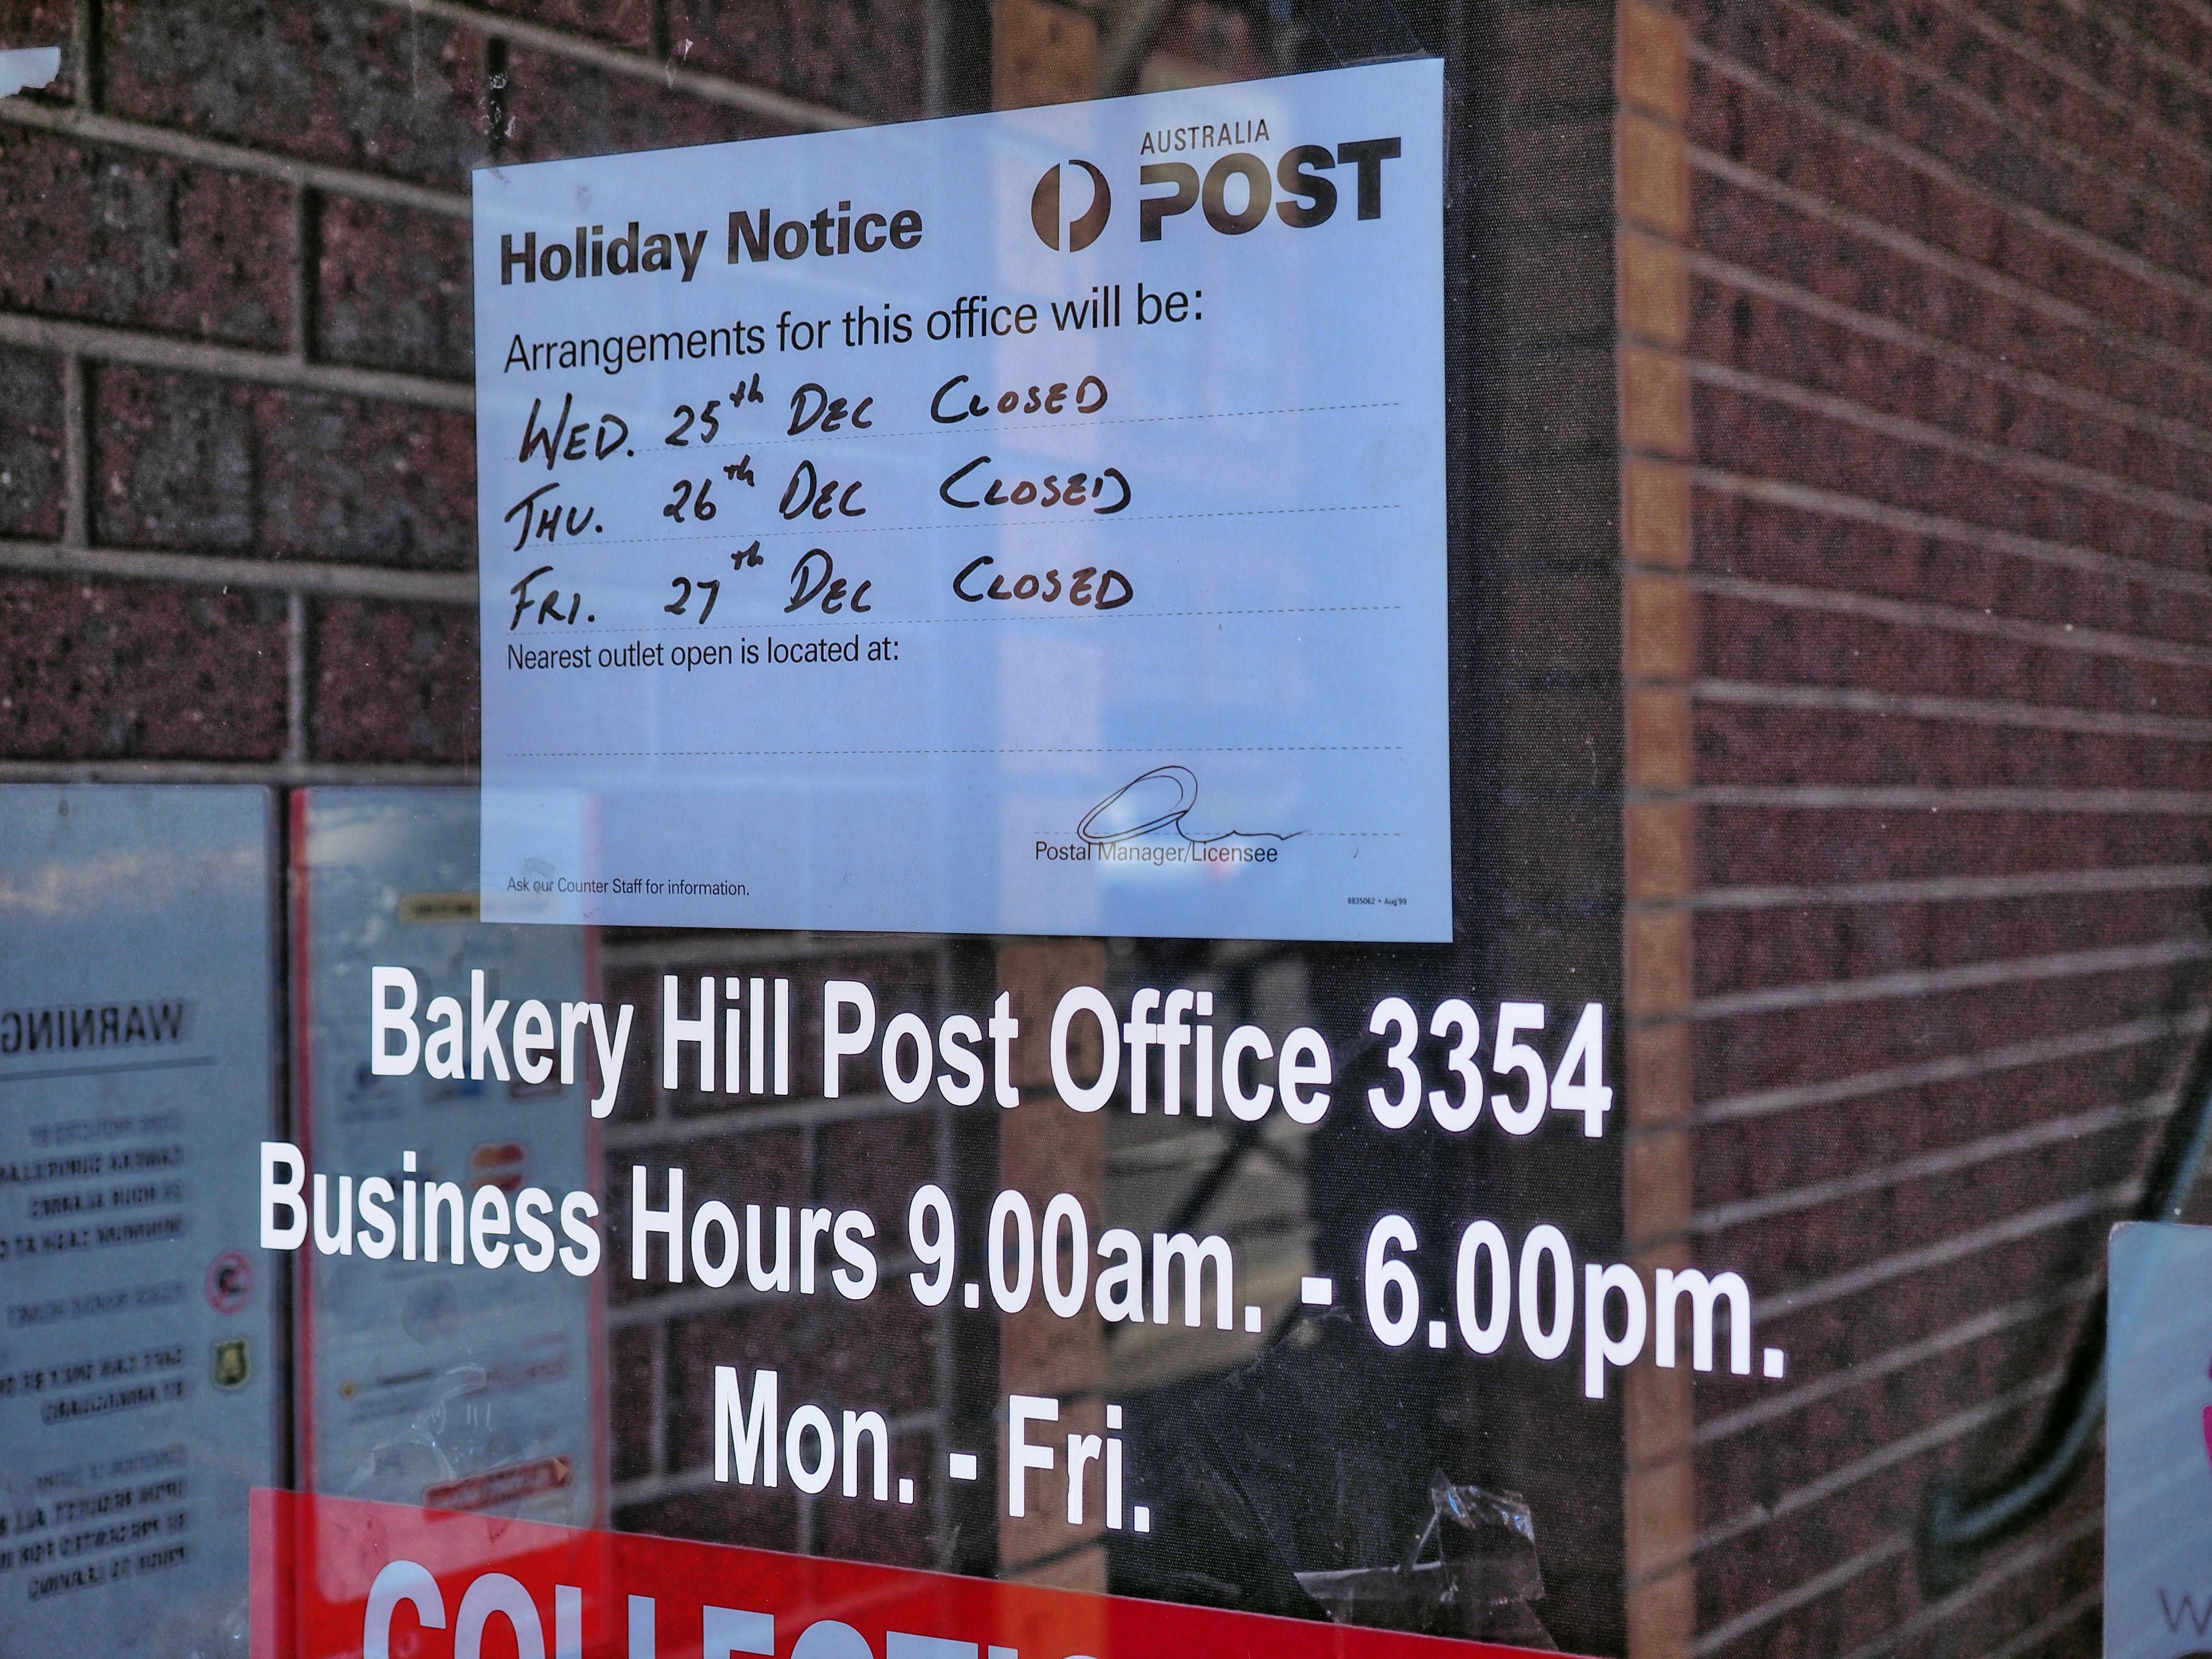 Bakery-Hill-Post-Office-1.jpeg